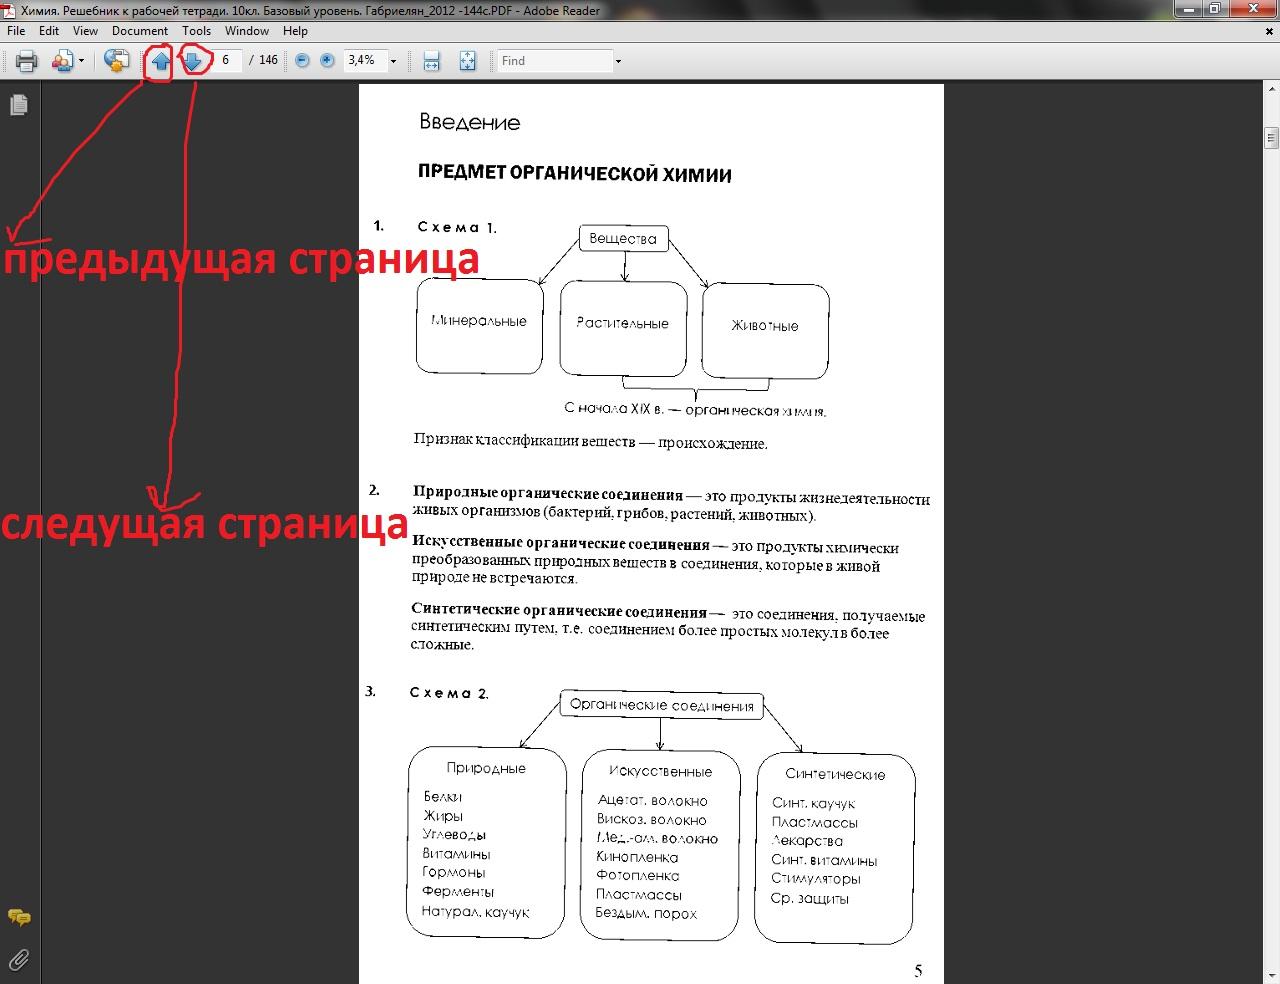 химия рабочая тетрадь 10 класс габриелян решебник онлайн